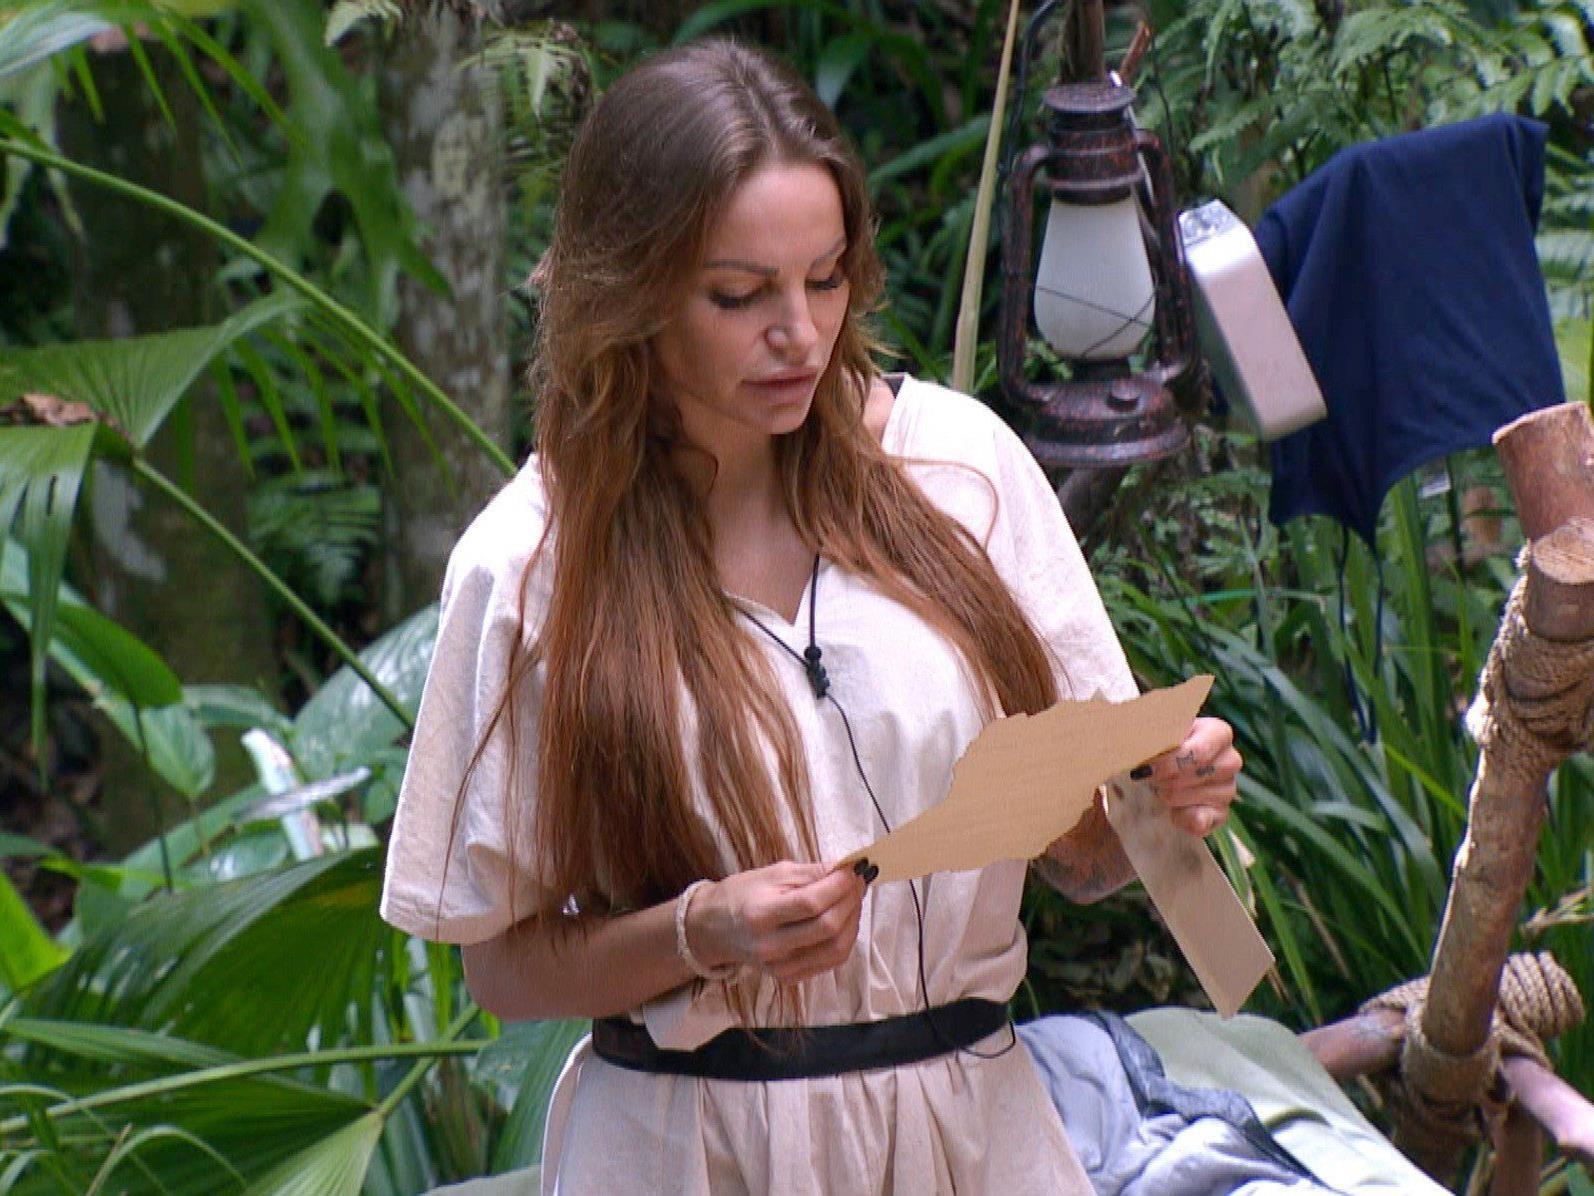 Gina Lisa muss am 11. Tag das Dschungelcamp verlassen.